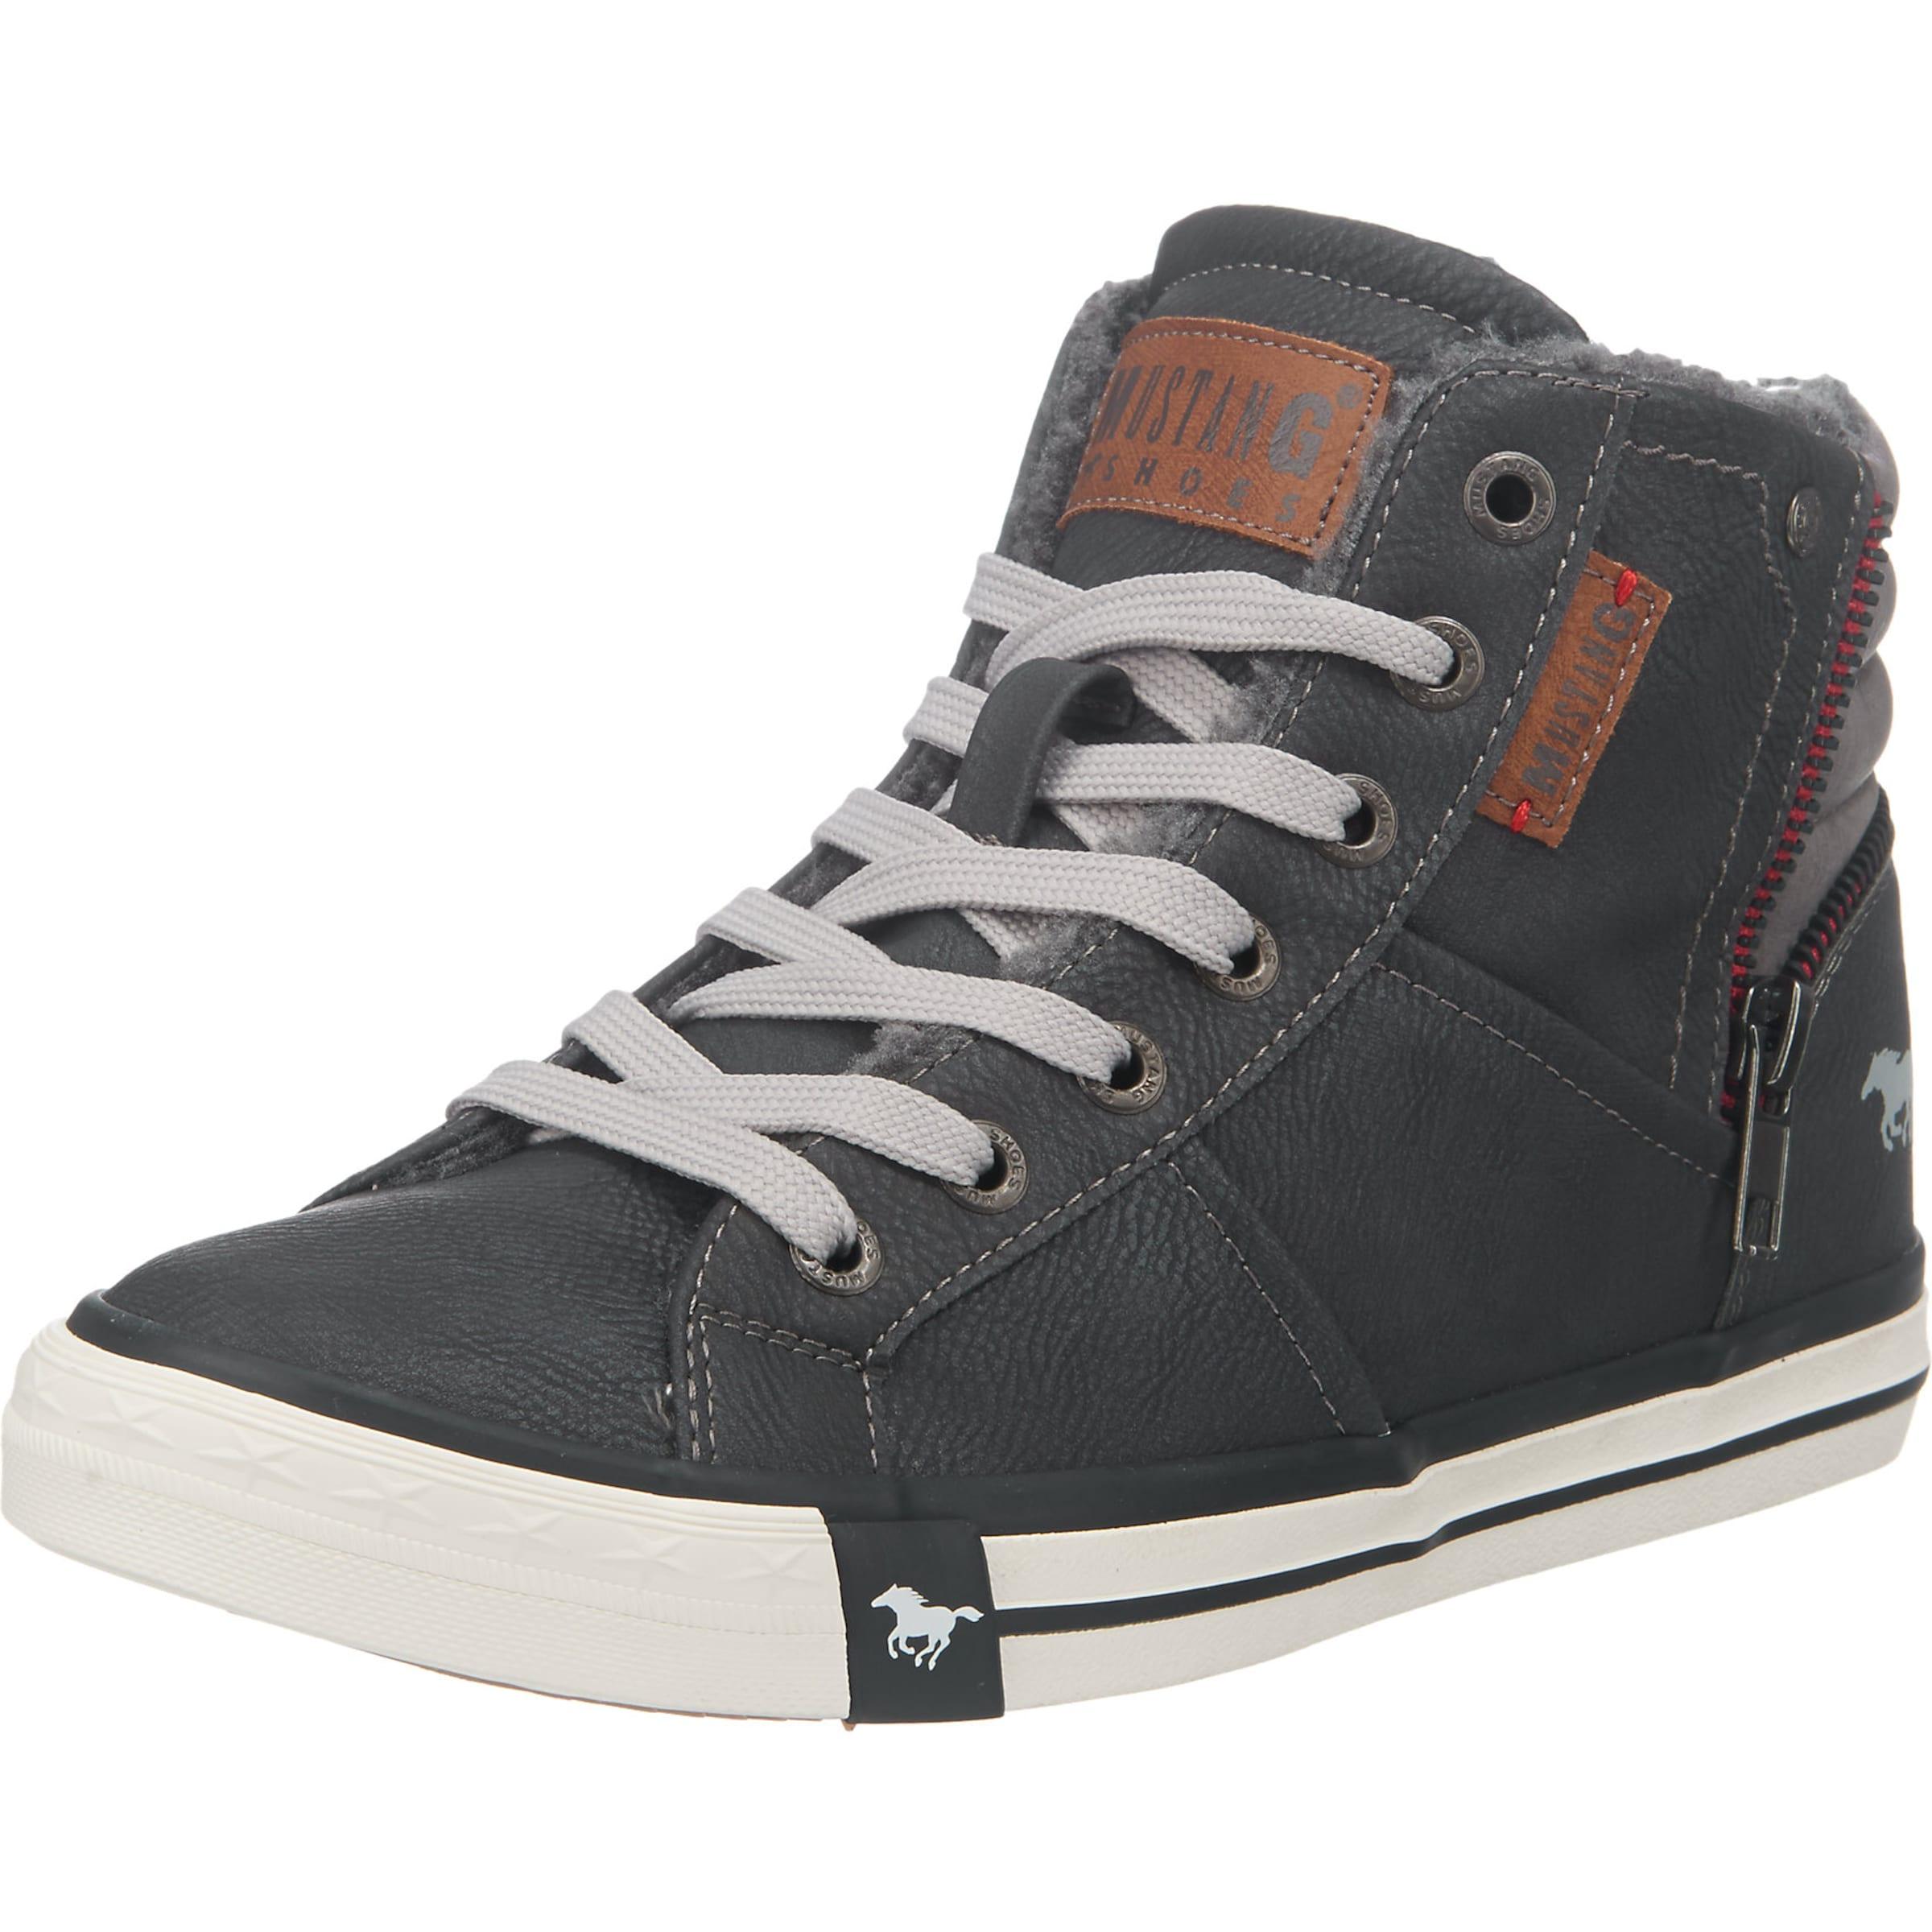 MUSTANG Sneaker in Leder-Optik Günstige und langlebige Schuhe